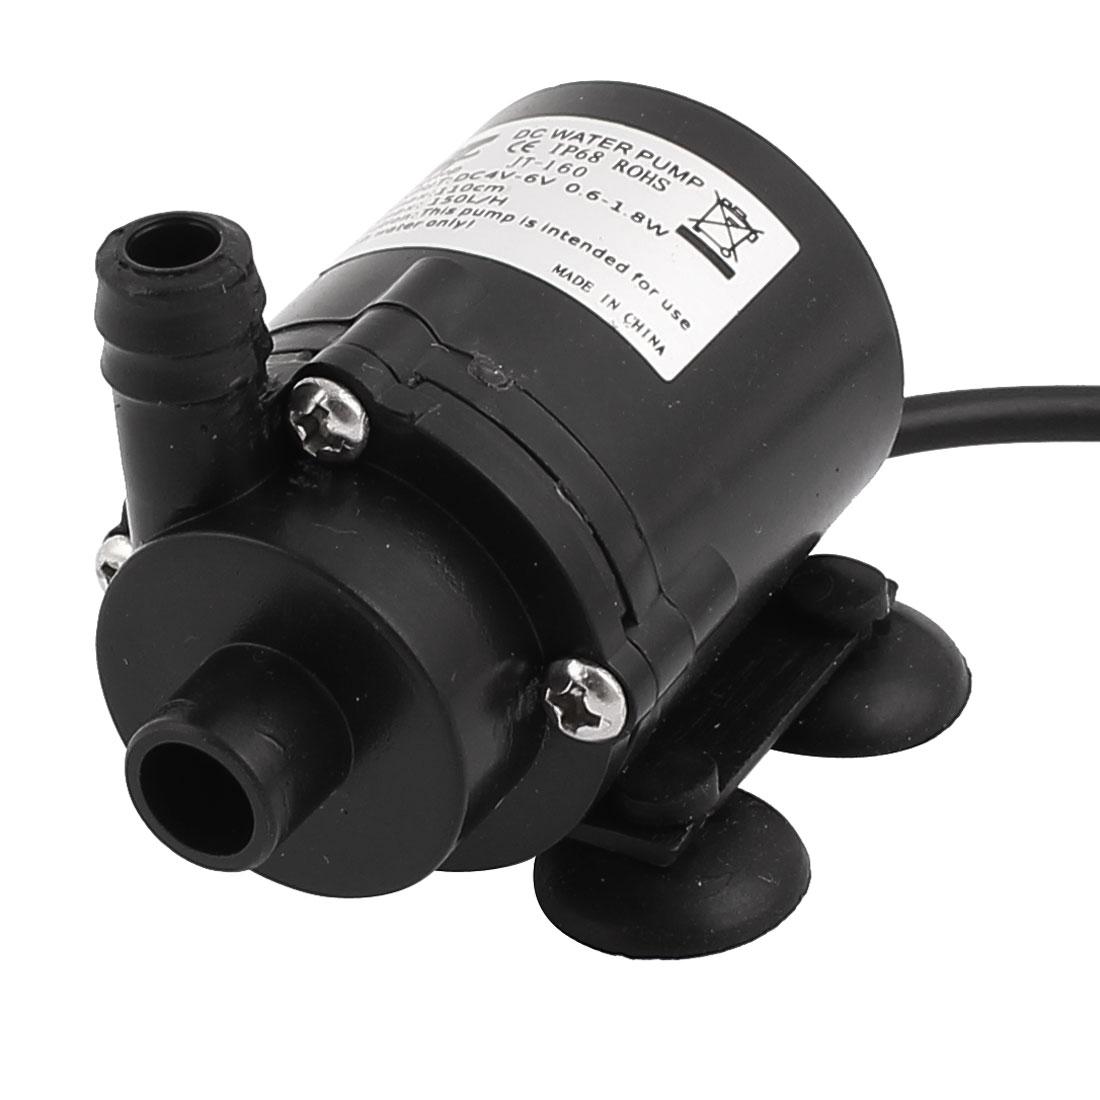 DC 4V-6V 0.6-1.8W Brushless Mini Inlet Outlet Submersible Pump for Aquarium USB Pulg